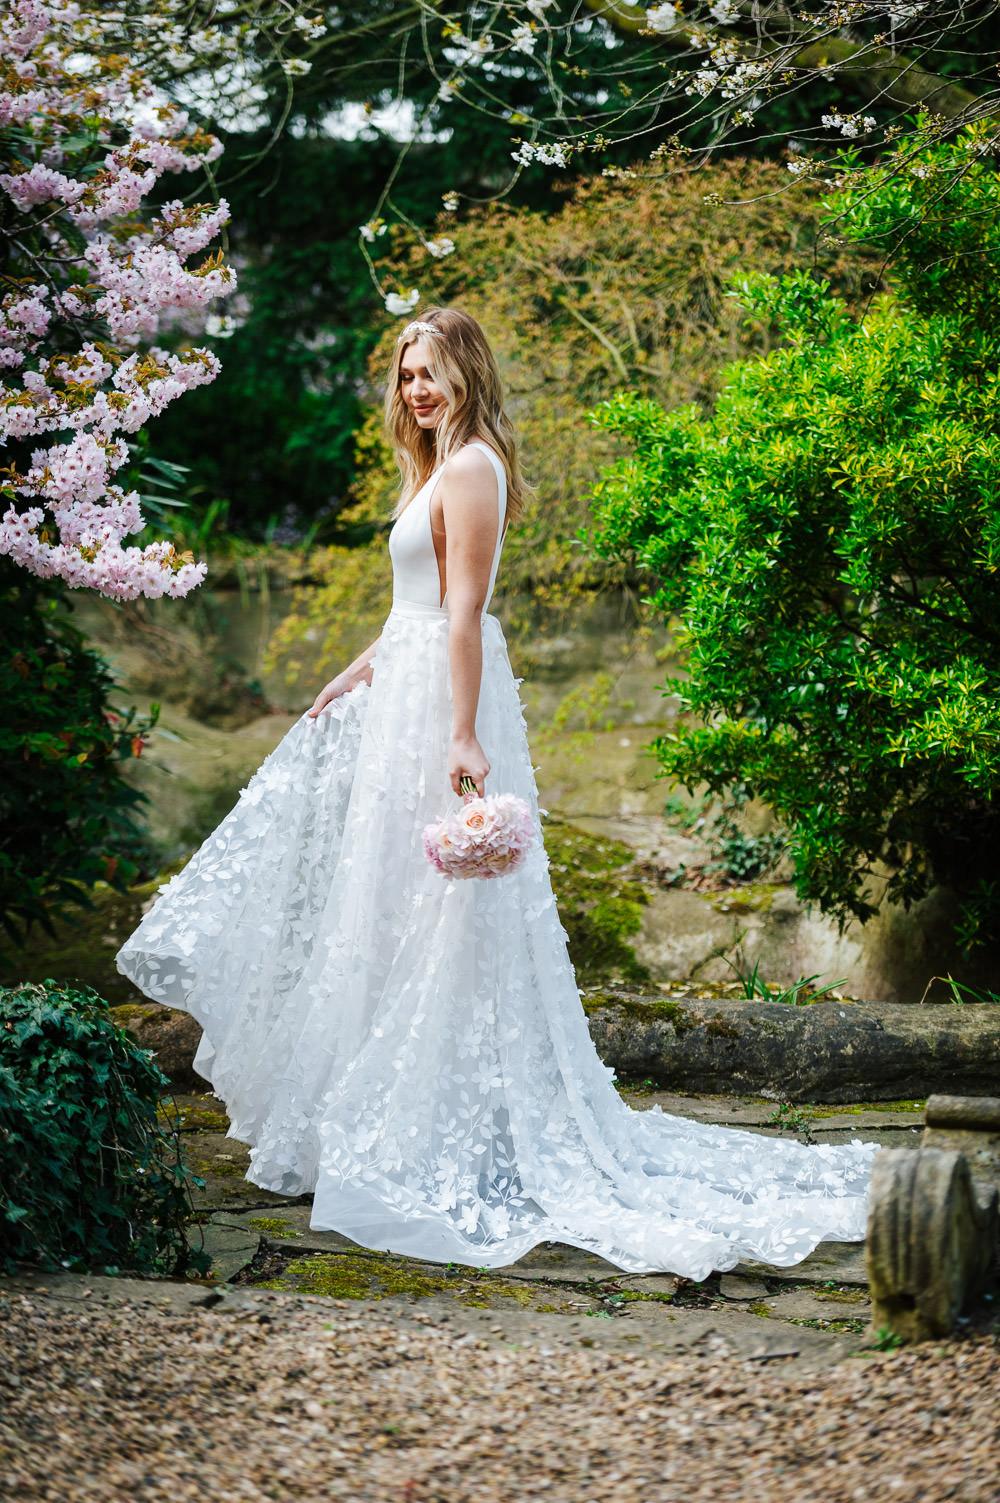 Dress Gown Bride Bridal Straps Train Floral Applique Cherry Blossom Wedding Ideas Sugarbird Photography